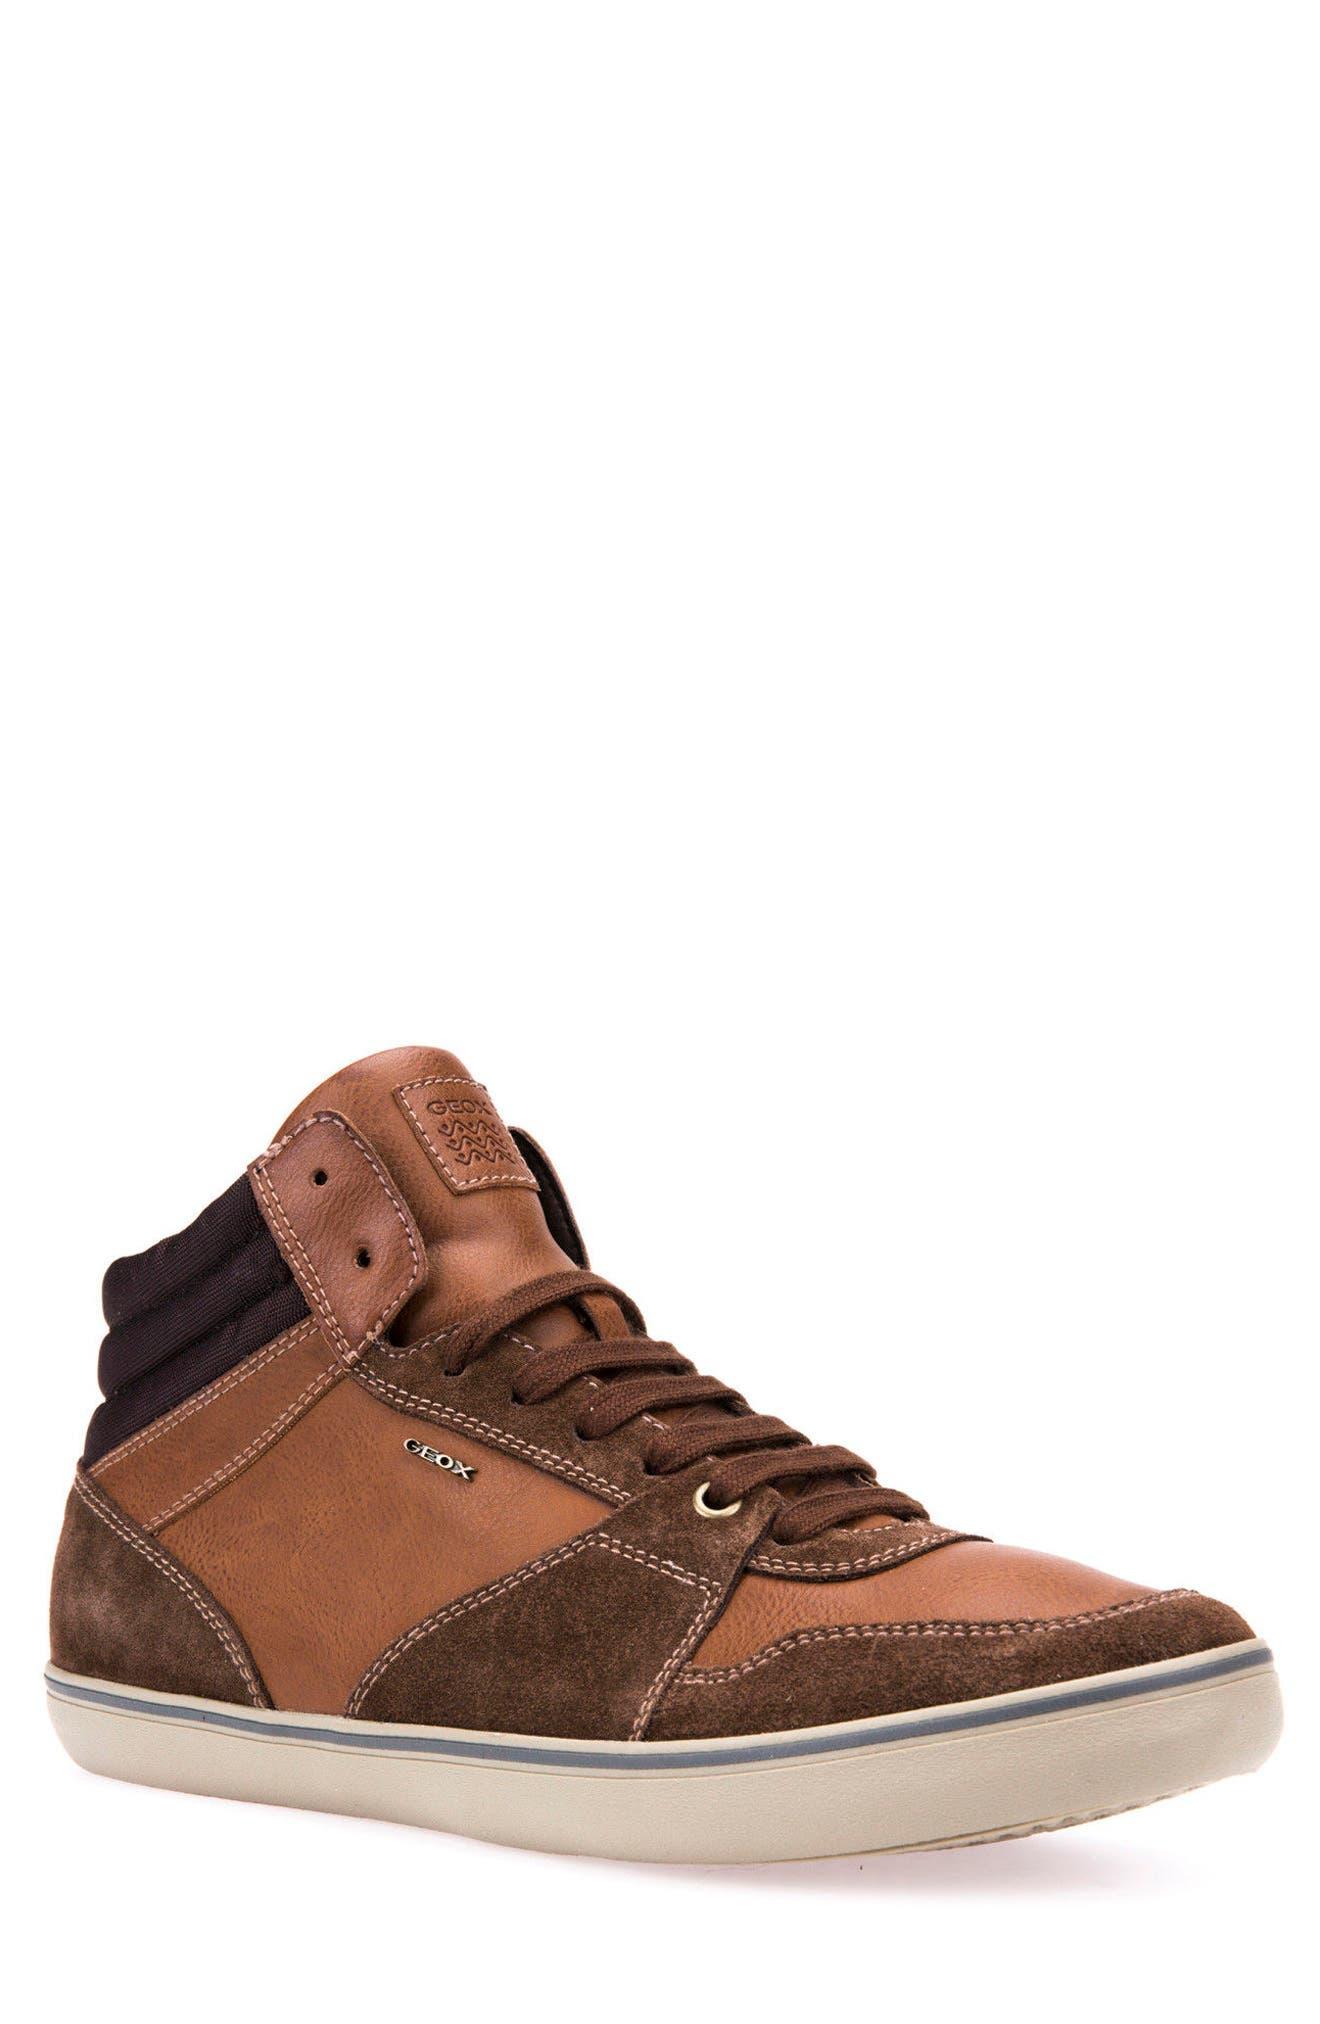 Box 30 High Top Sneaker,                         Main,                         color,